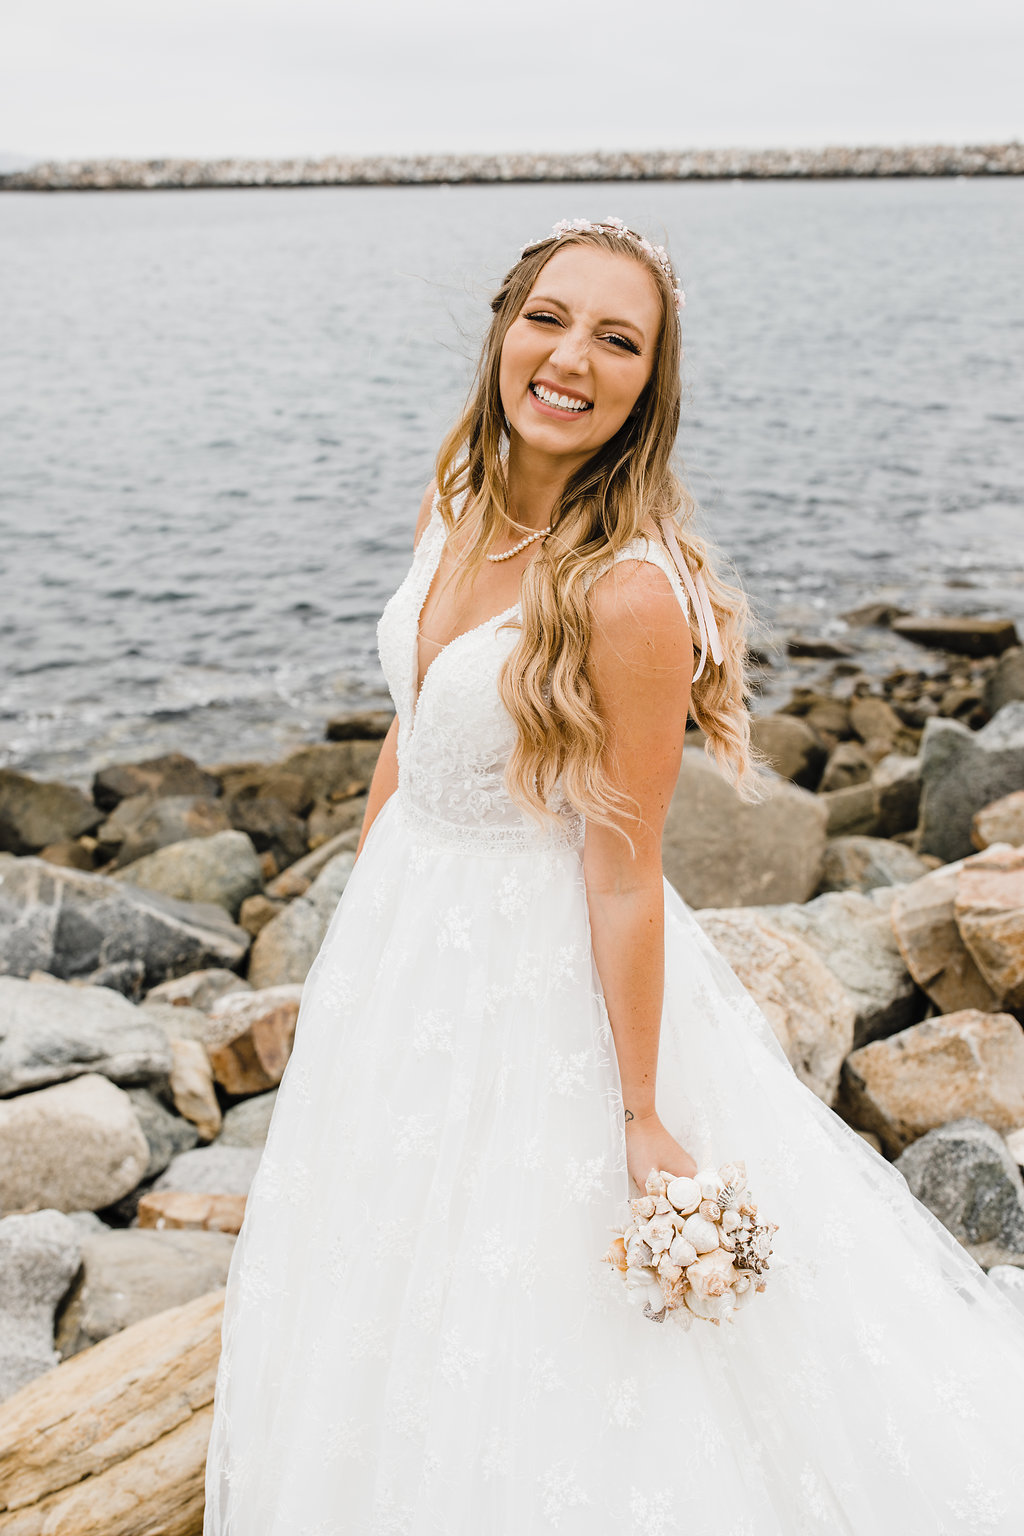 california rocky beach bride wedding day formals